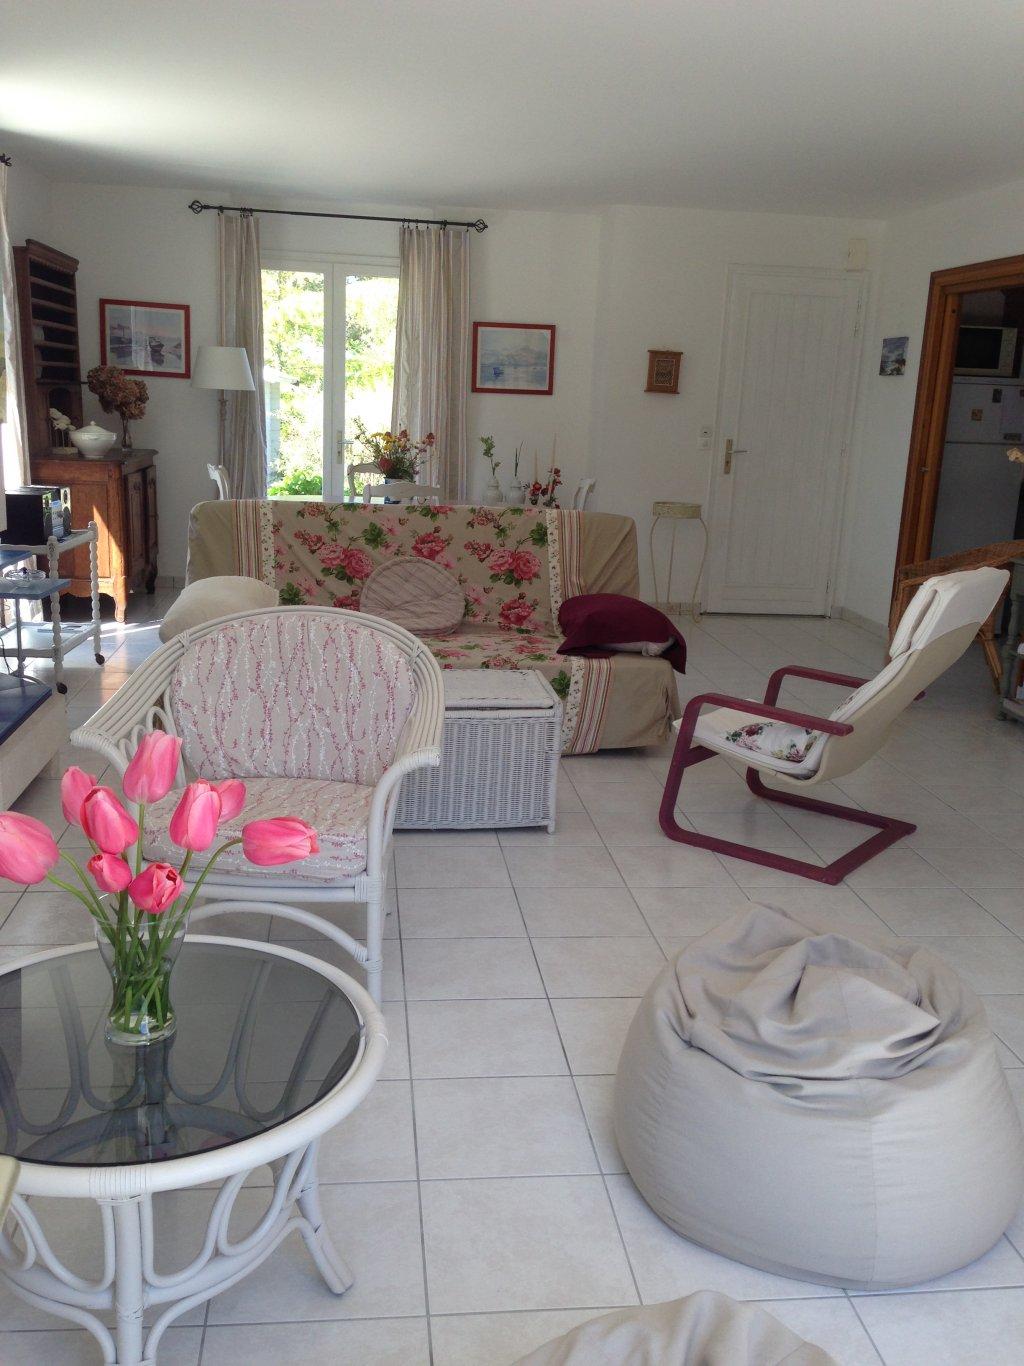 Maison vacances saint gildas de rhuys location 6 personnes for Gildas salon